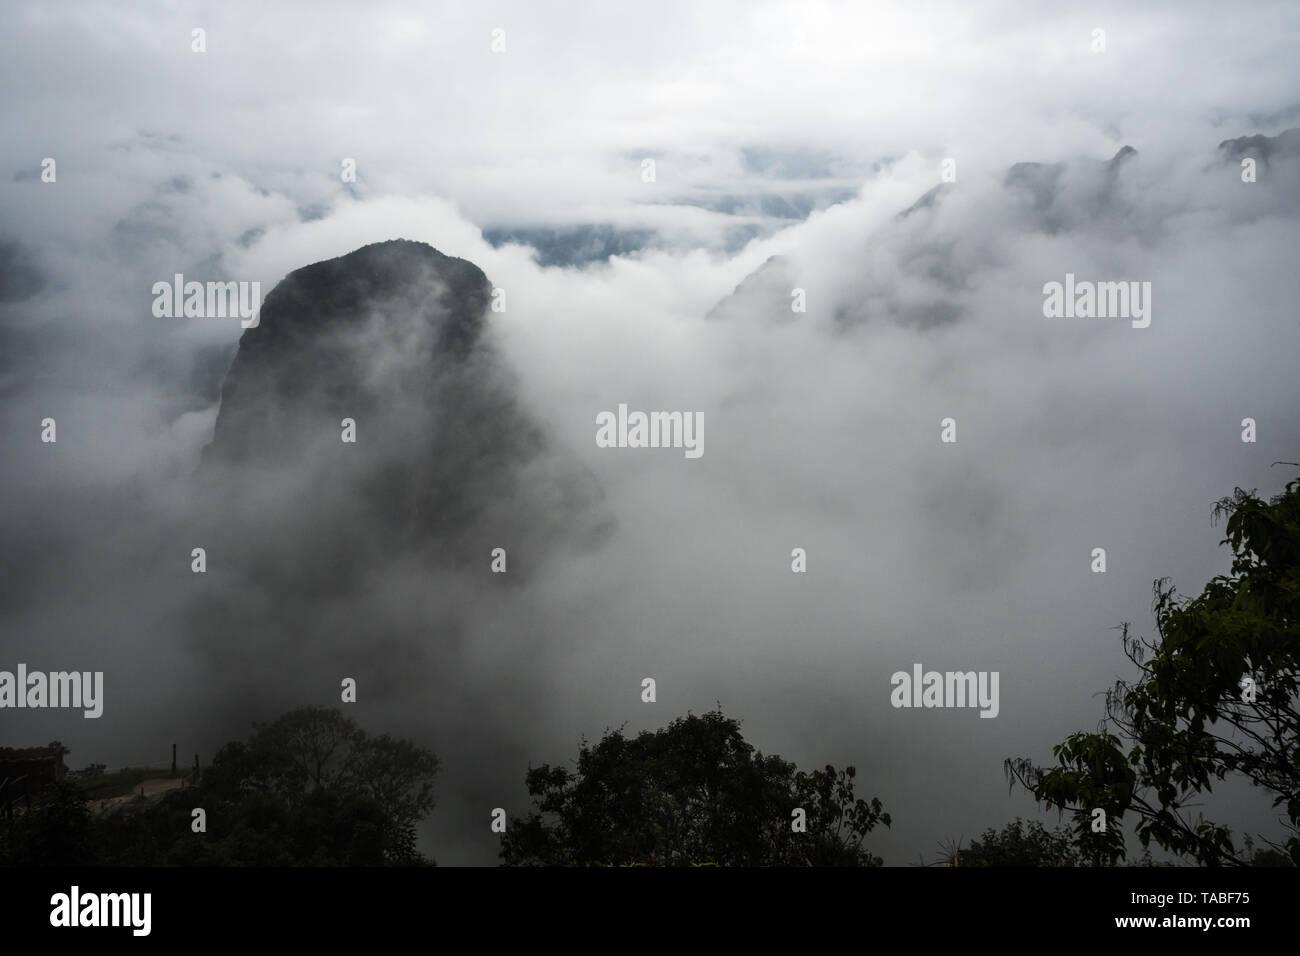 Mountains around Machu Picchu among the morning mists, Cuzco Peru - Stock Image